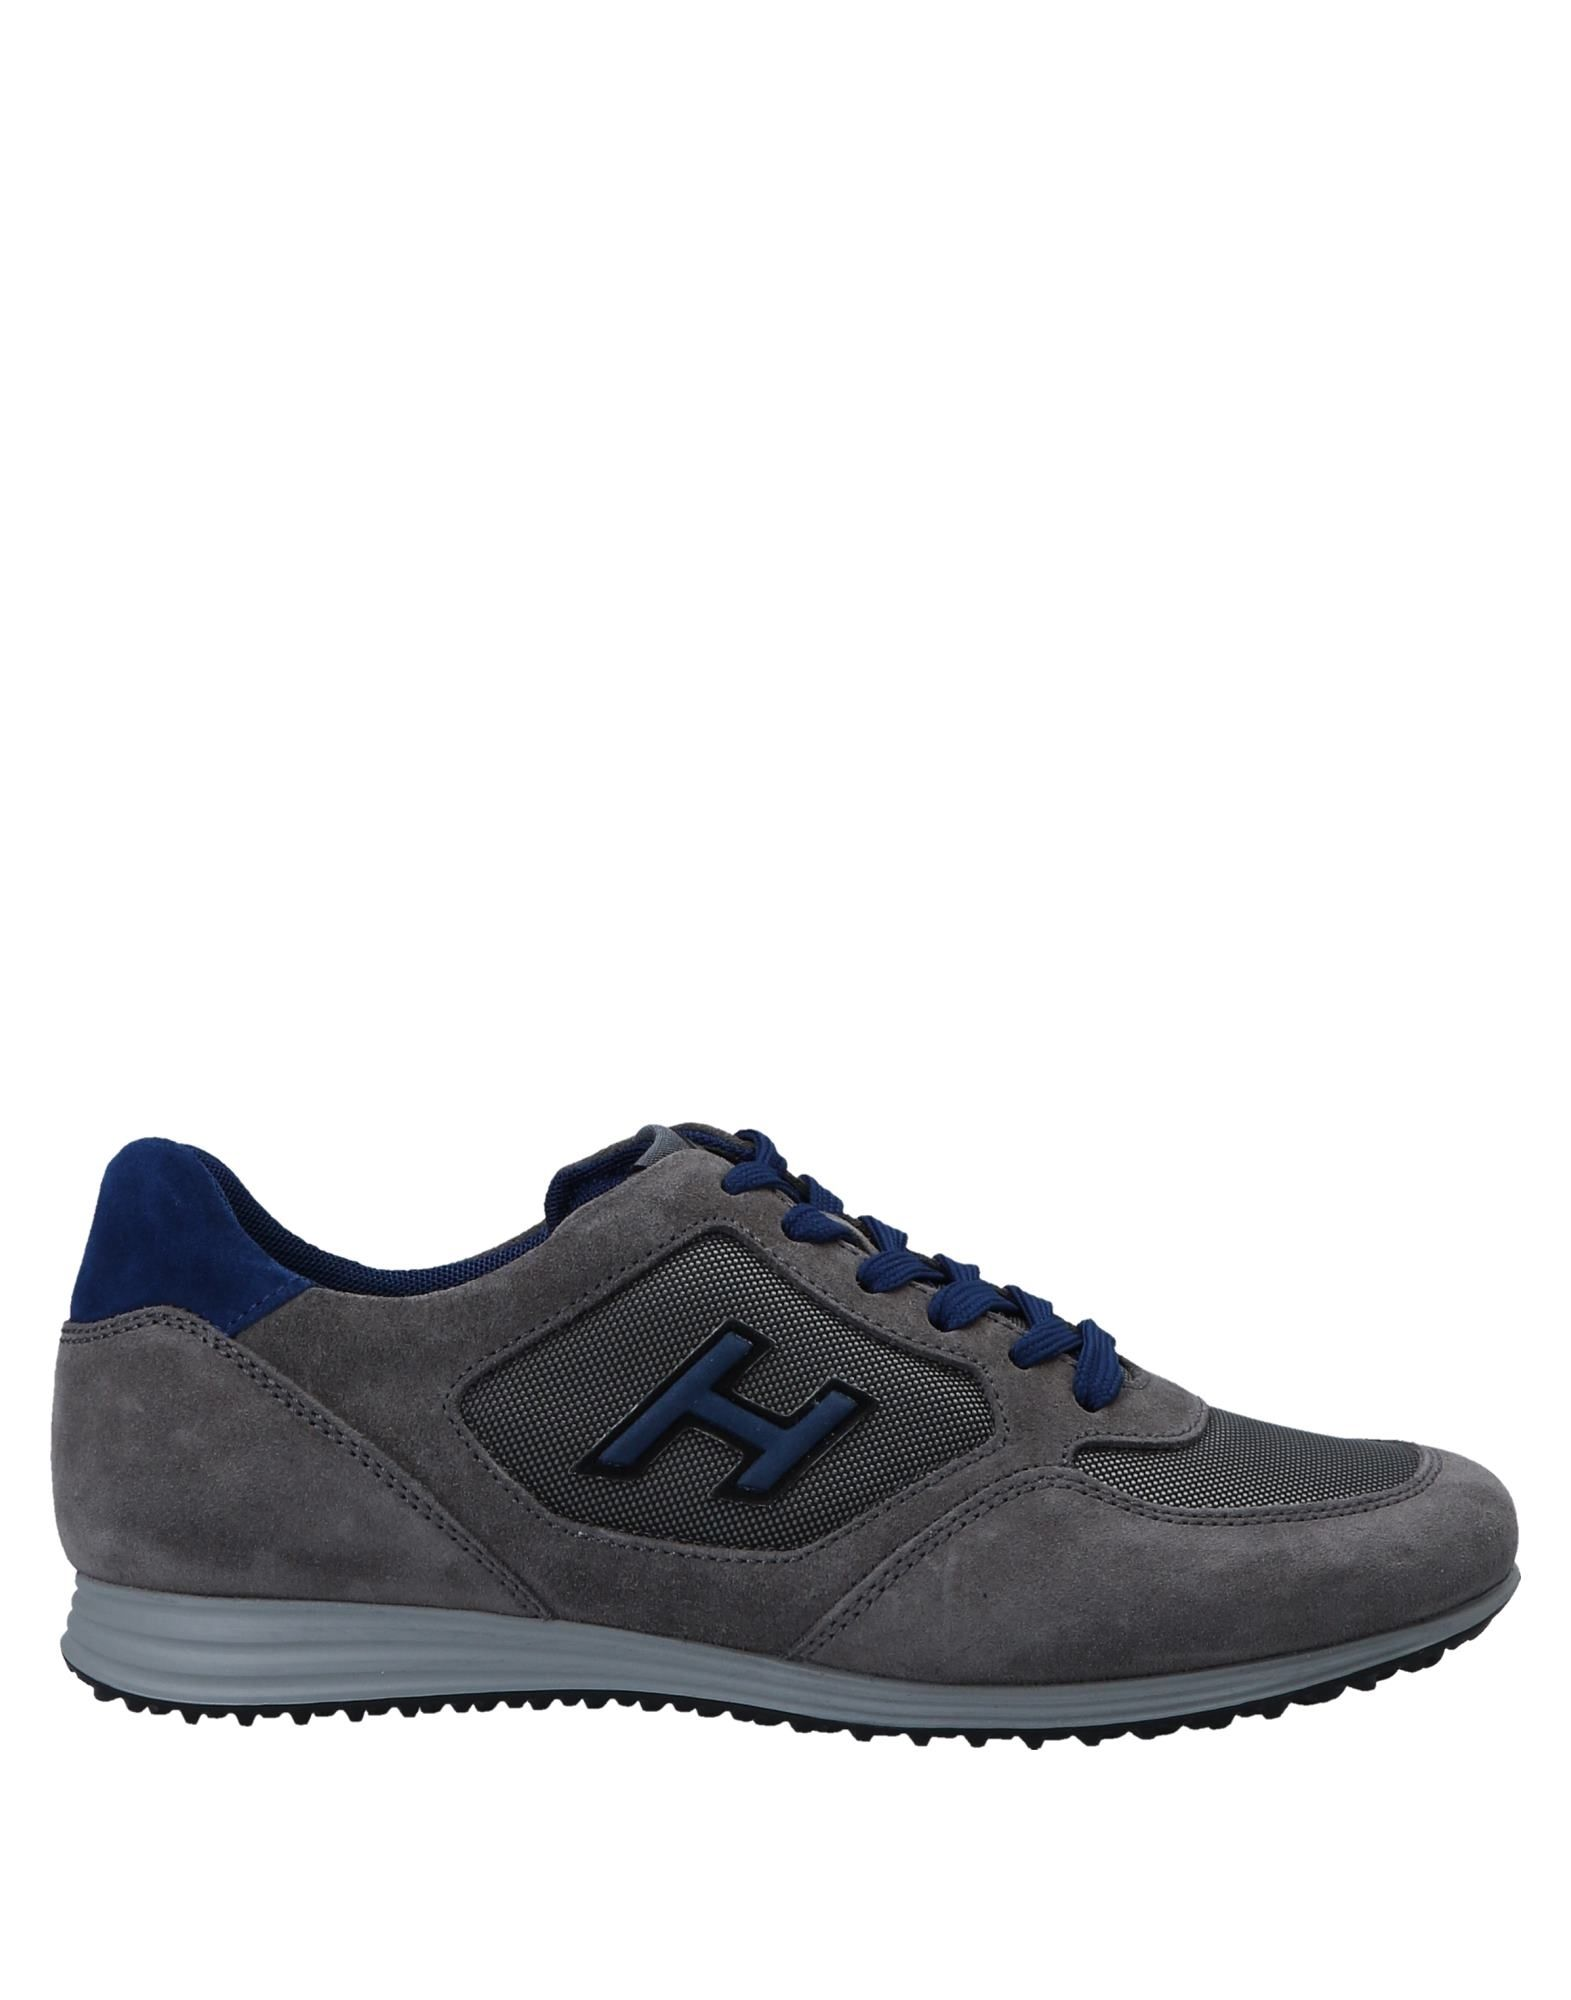 Hogan Sneakers Herren  11559935FX Gute Qualität beliebte Schuhe